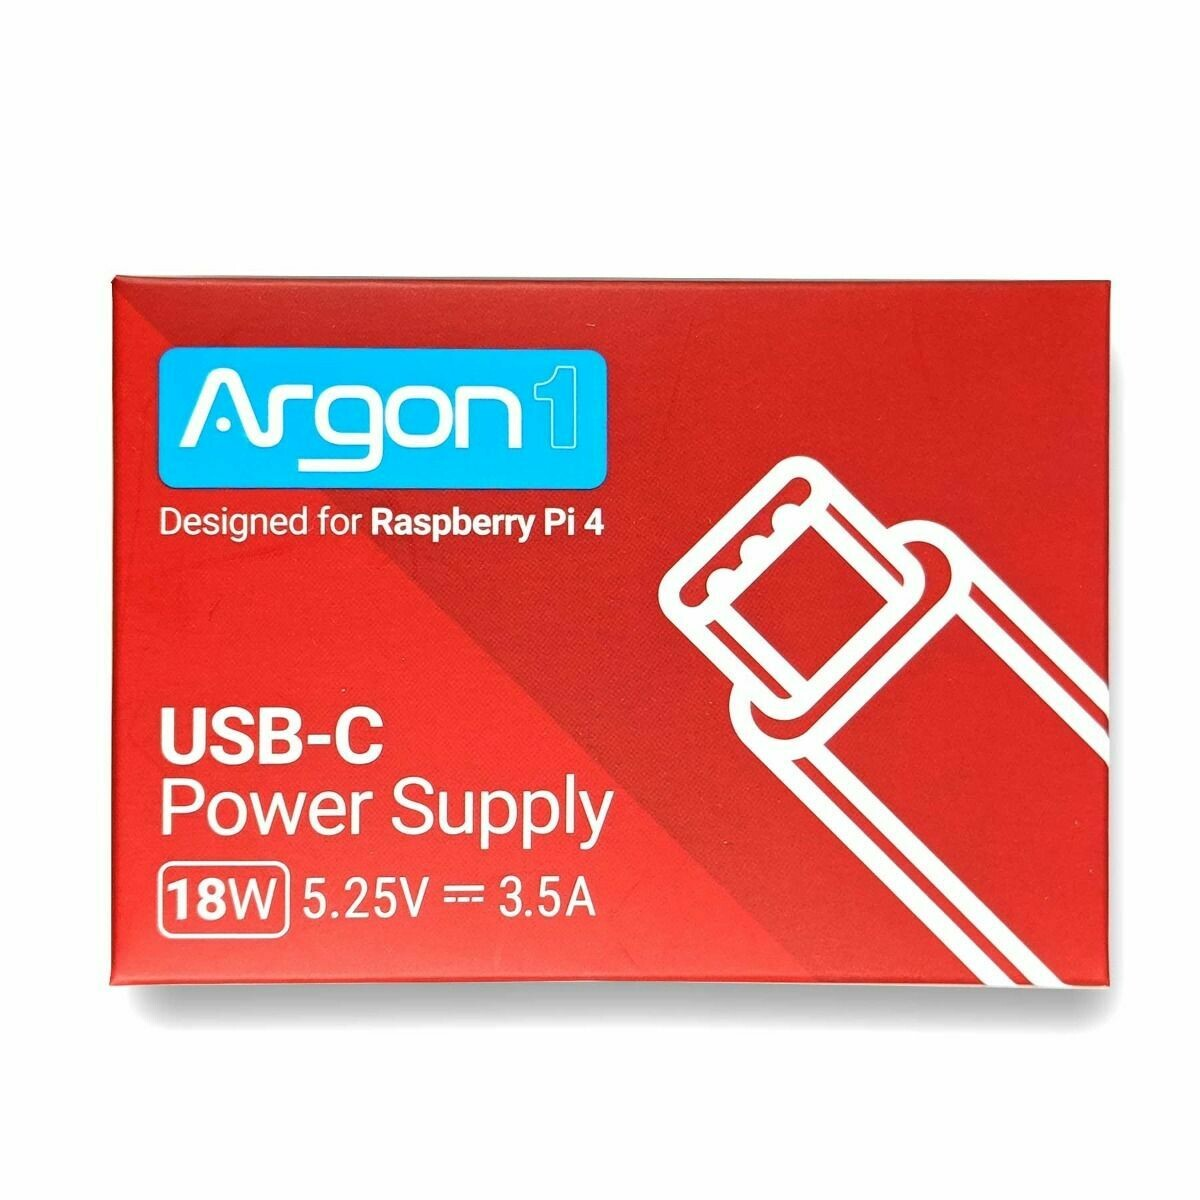 "Argon ""High Power"" Pi4 Adaptor.  (18w, 5.25v, 3.5a)"